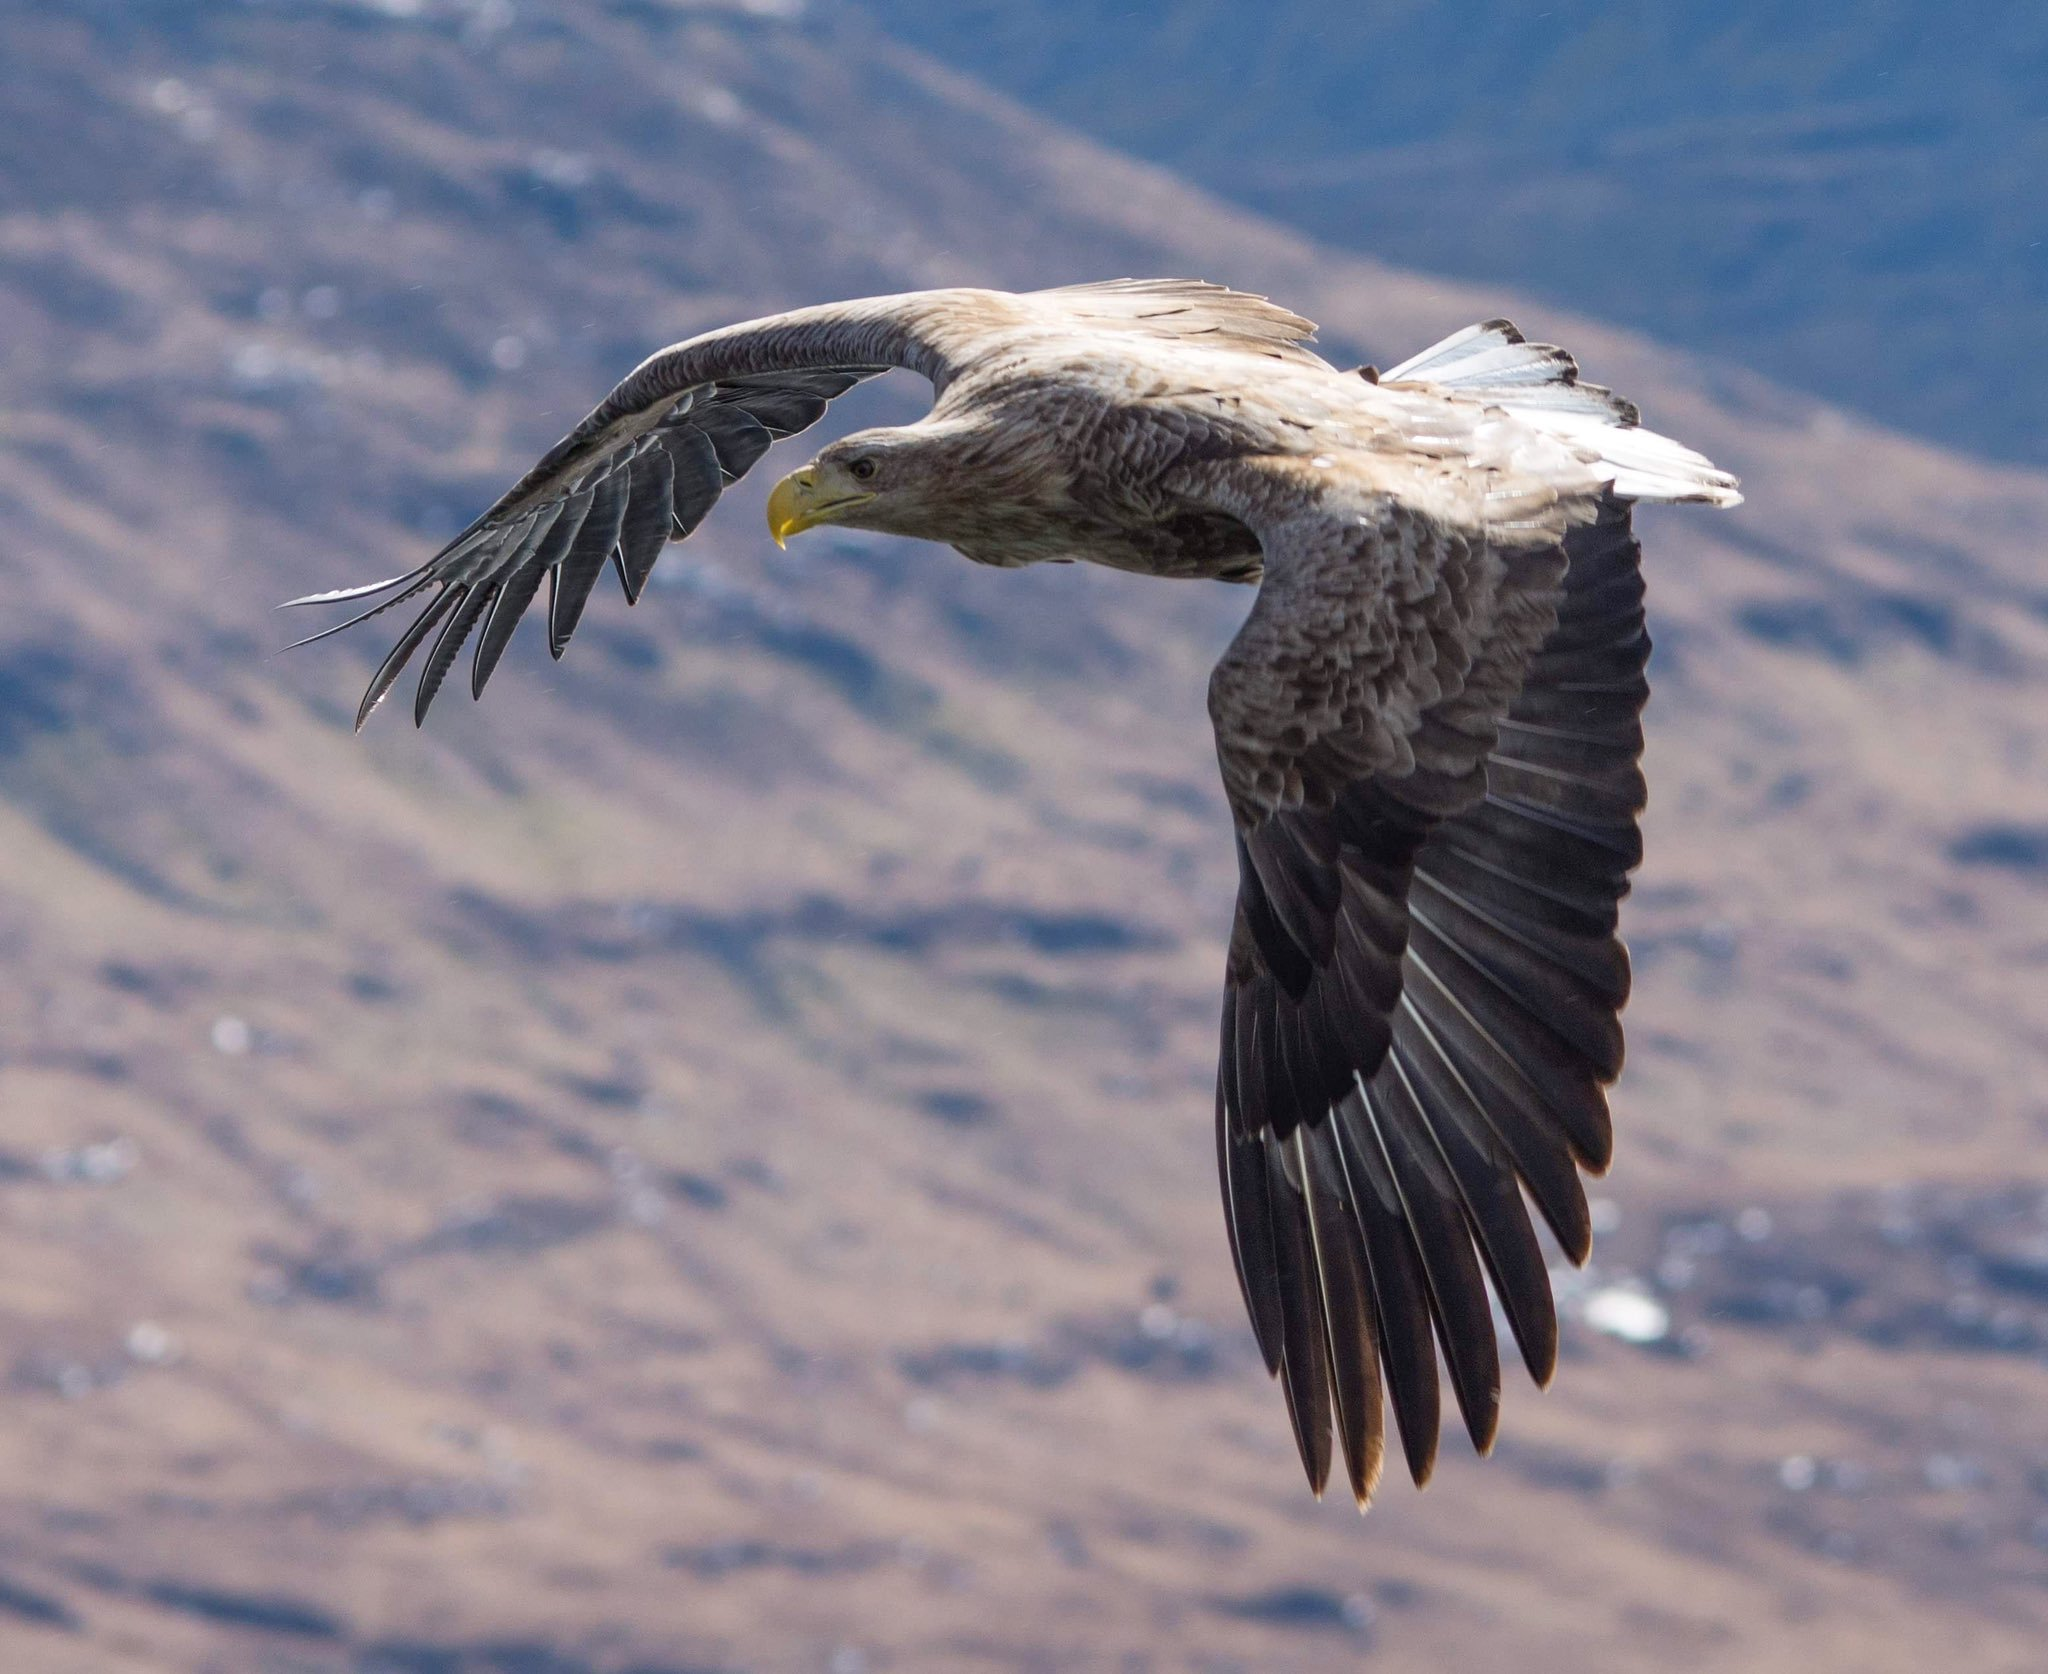 wildlife_photography_34.jpg